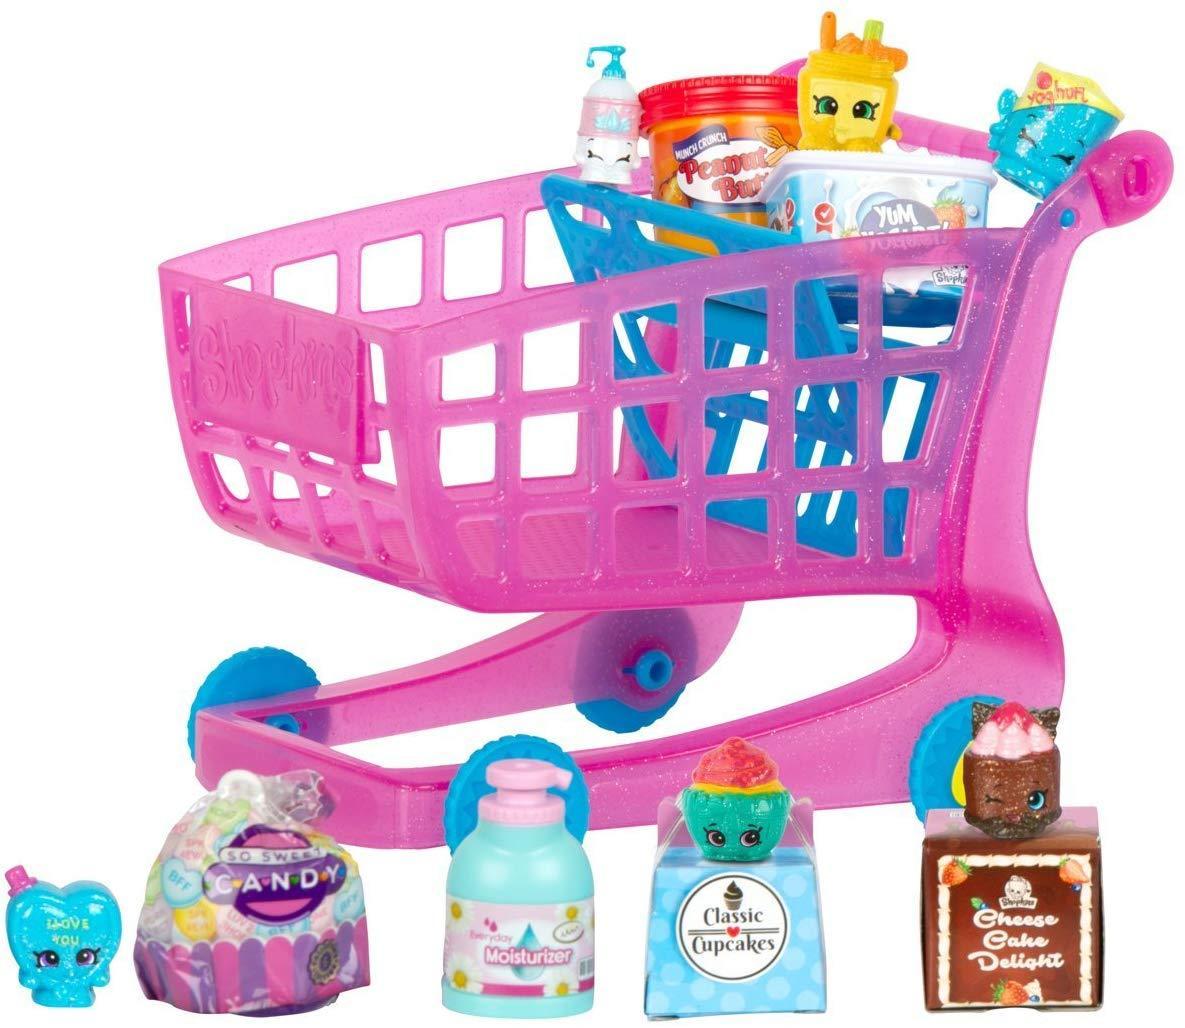 Набор Тележка с продуктами шопкинс. Shopkins Small Mart Shopping Cart